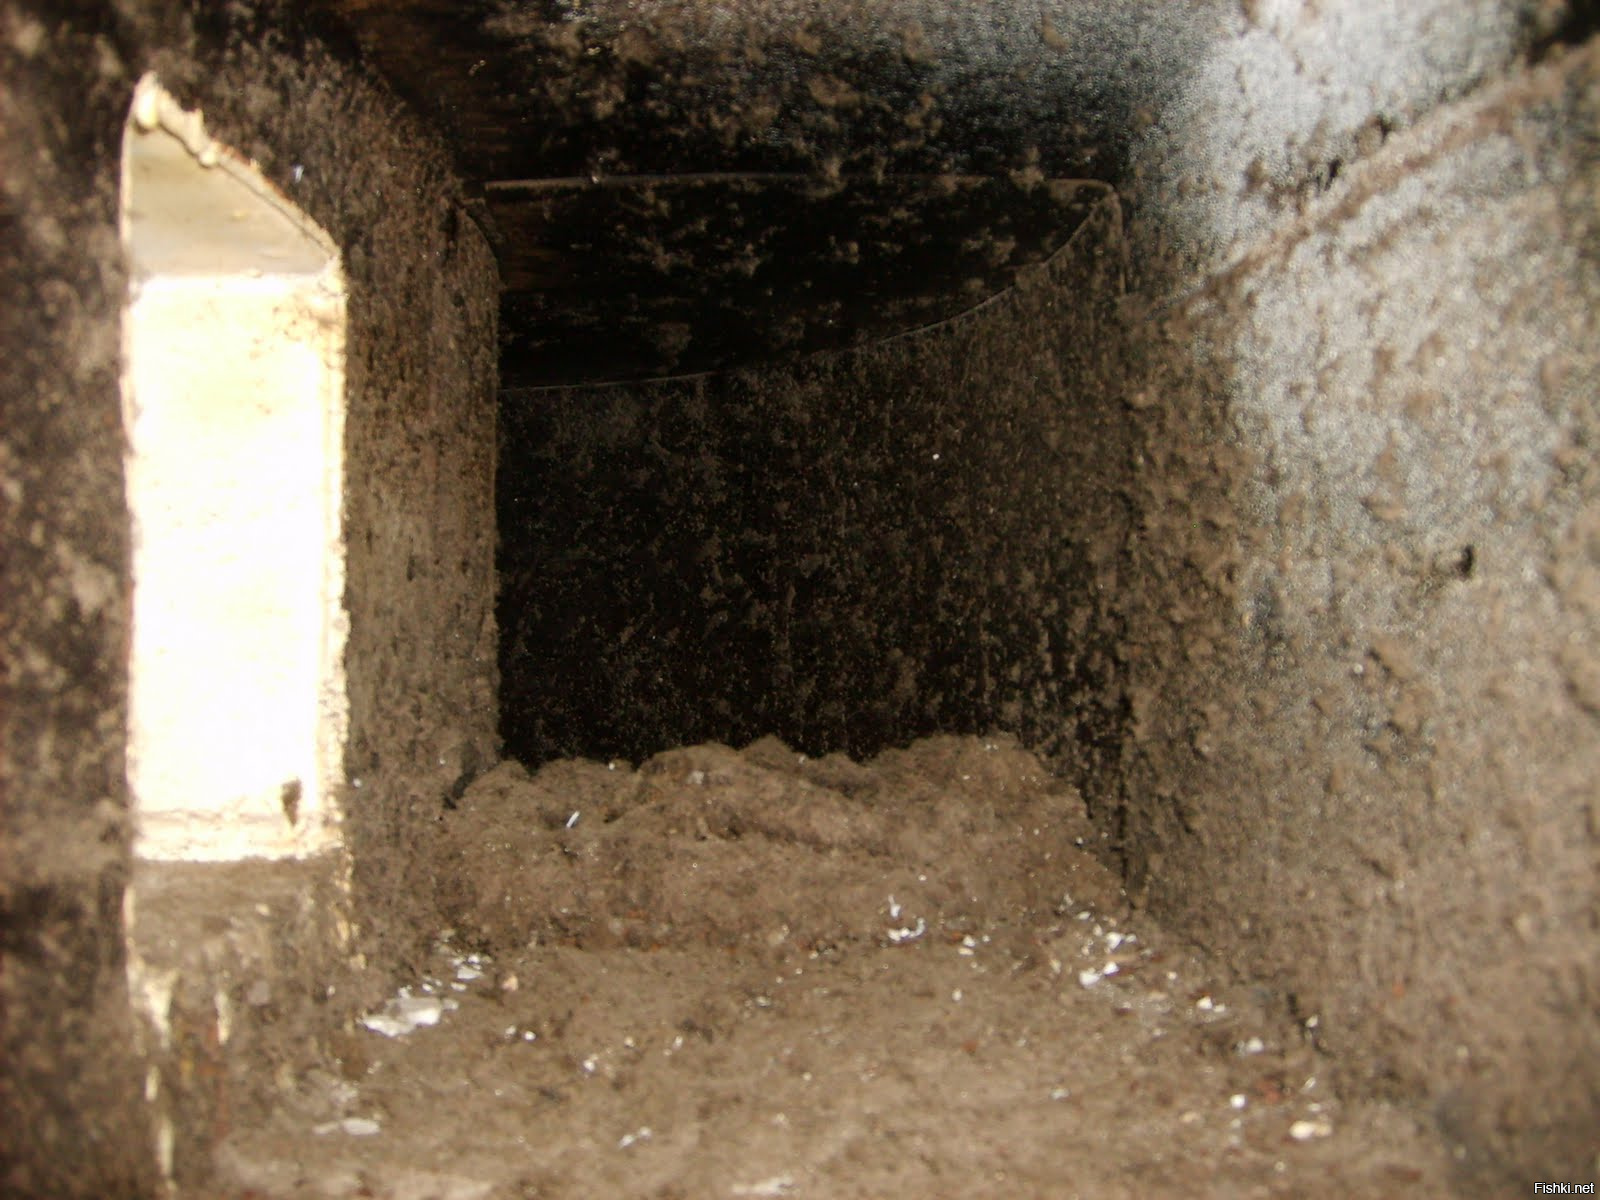 Чистка вентиляции: прочистка шахты в многоквартирном доме - точка j